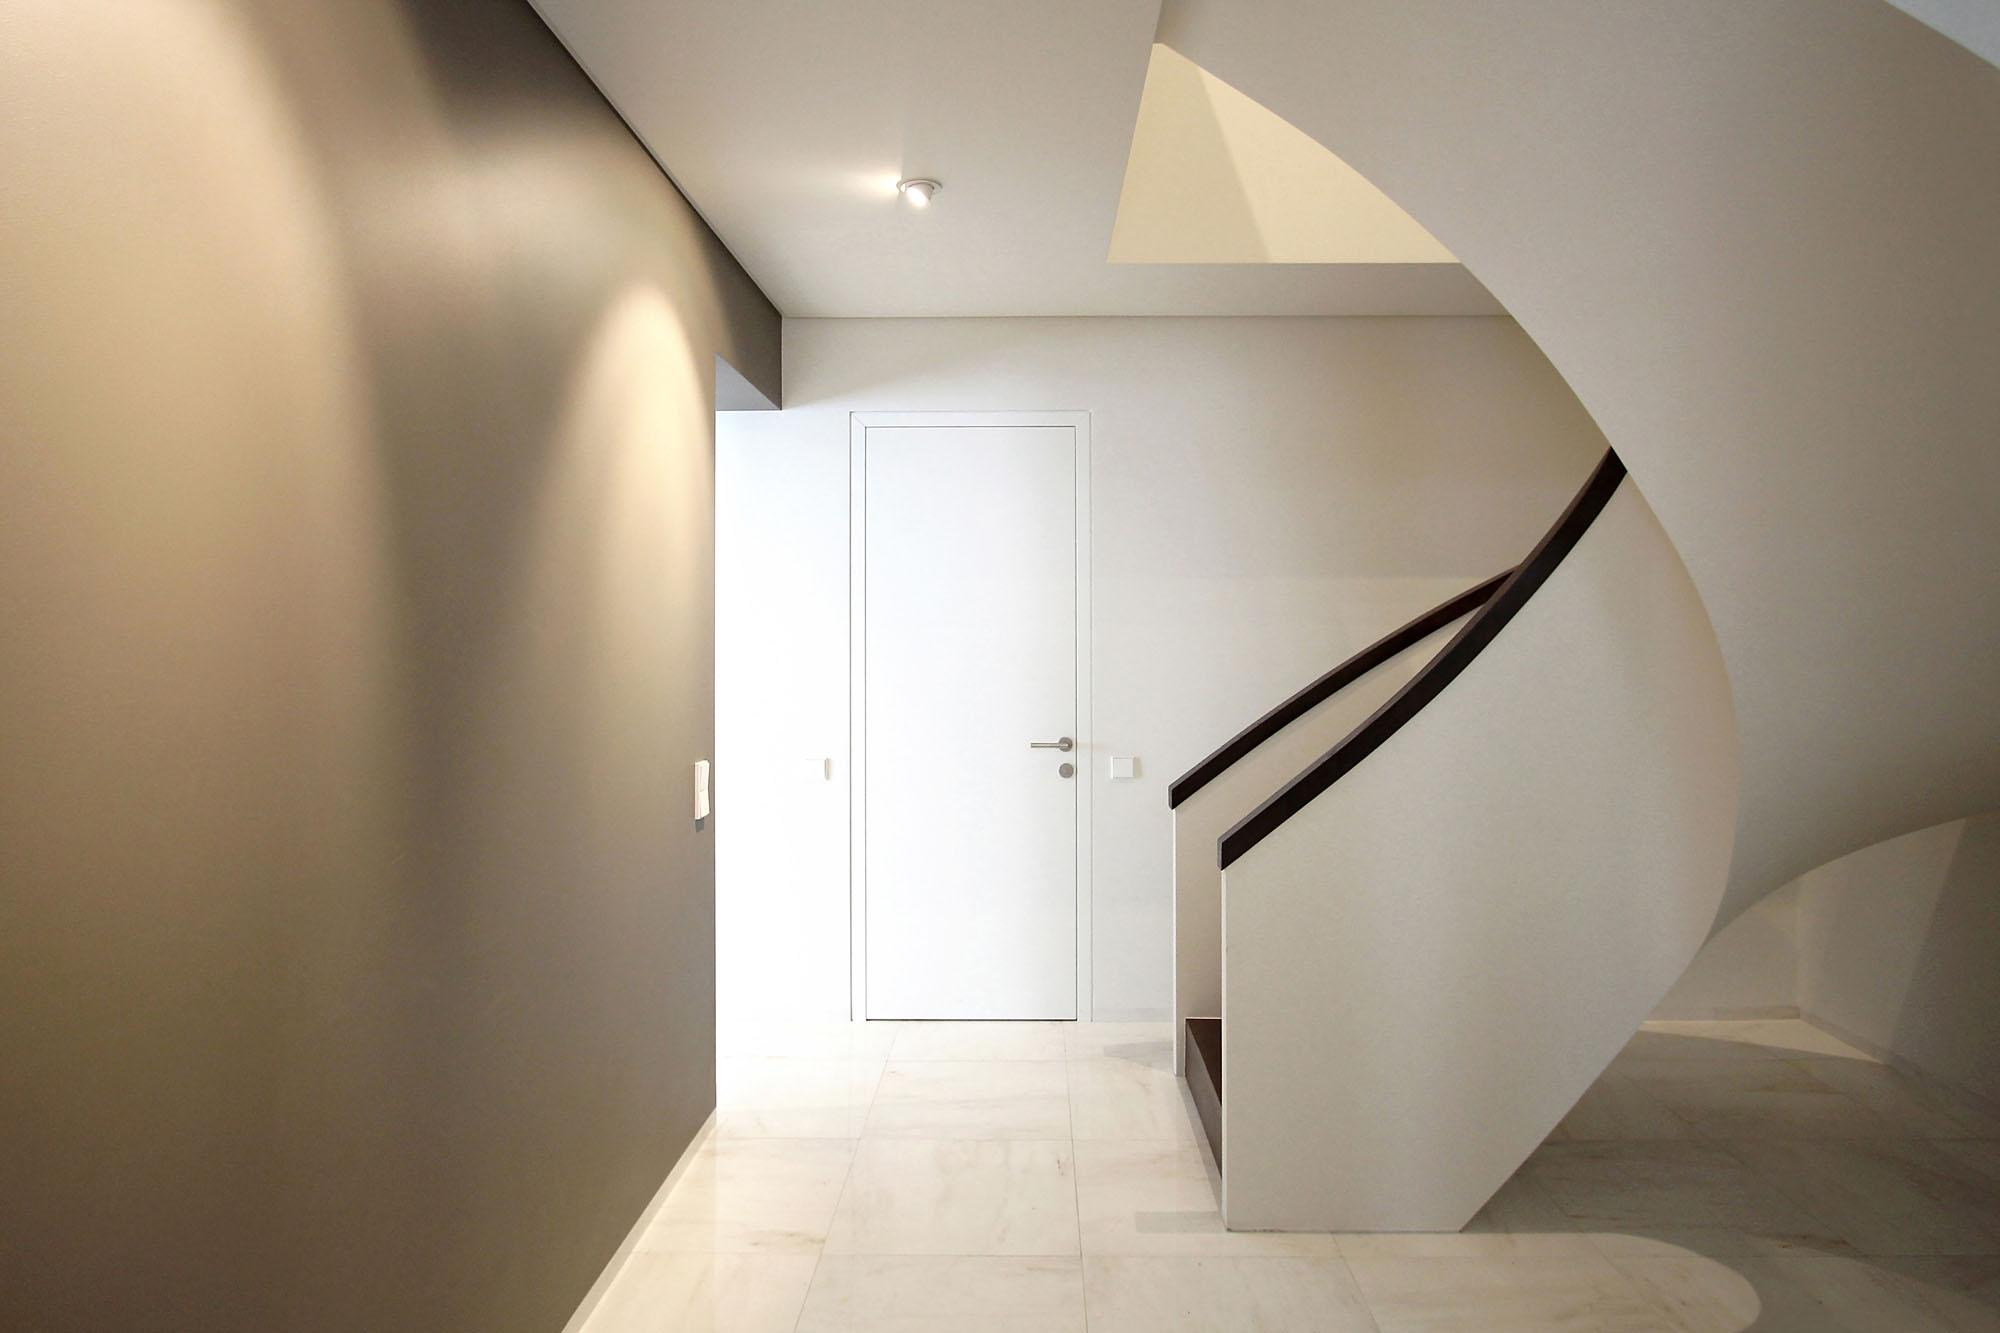 Minimal Style and White Colour Theme of House 02 by Ramunas Manikas-10